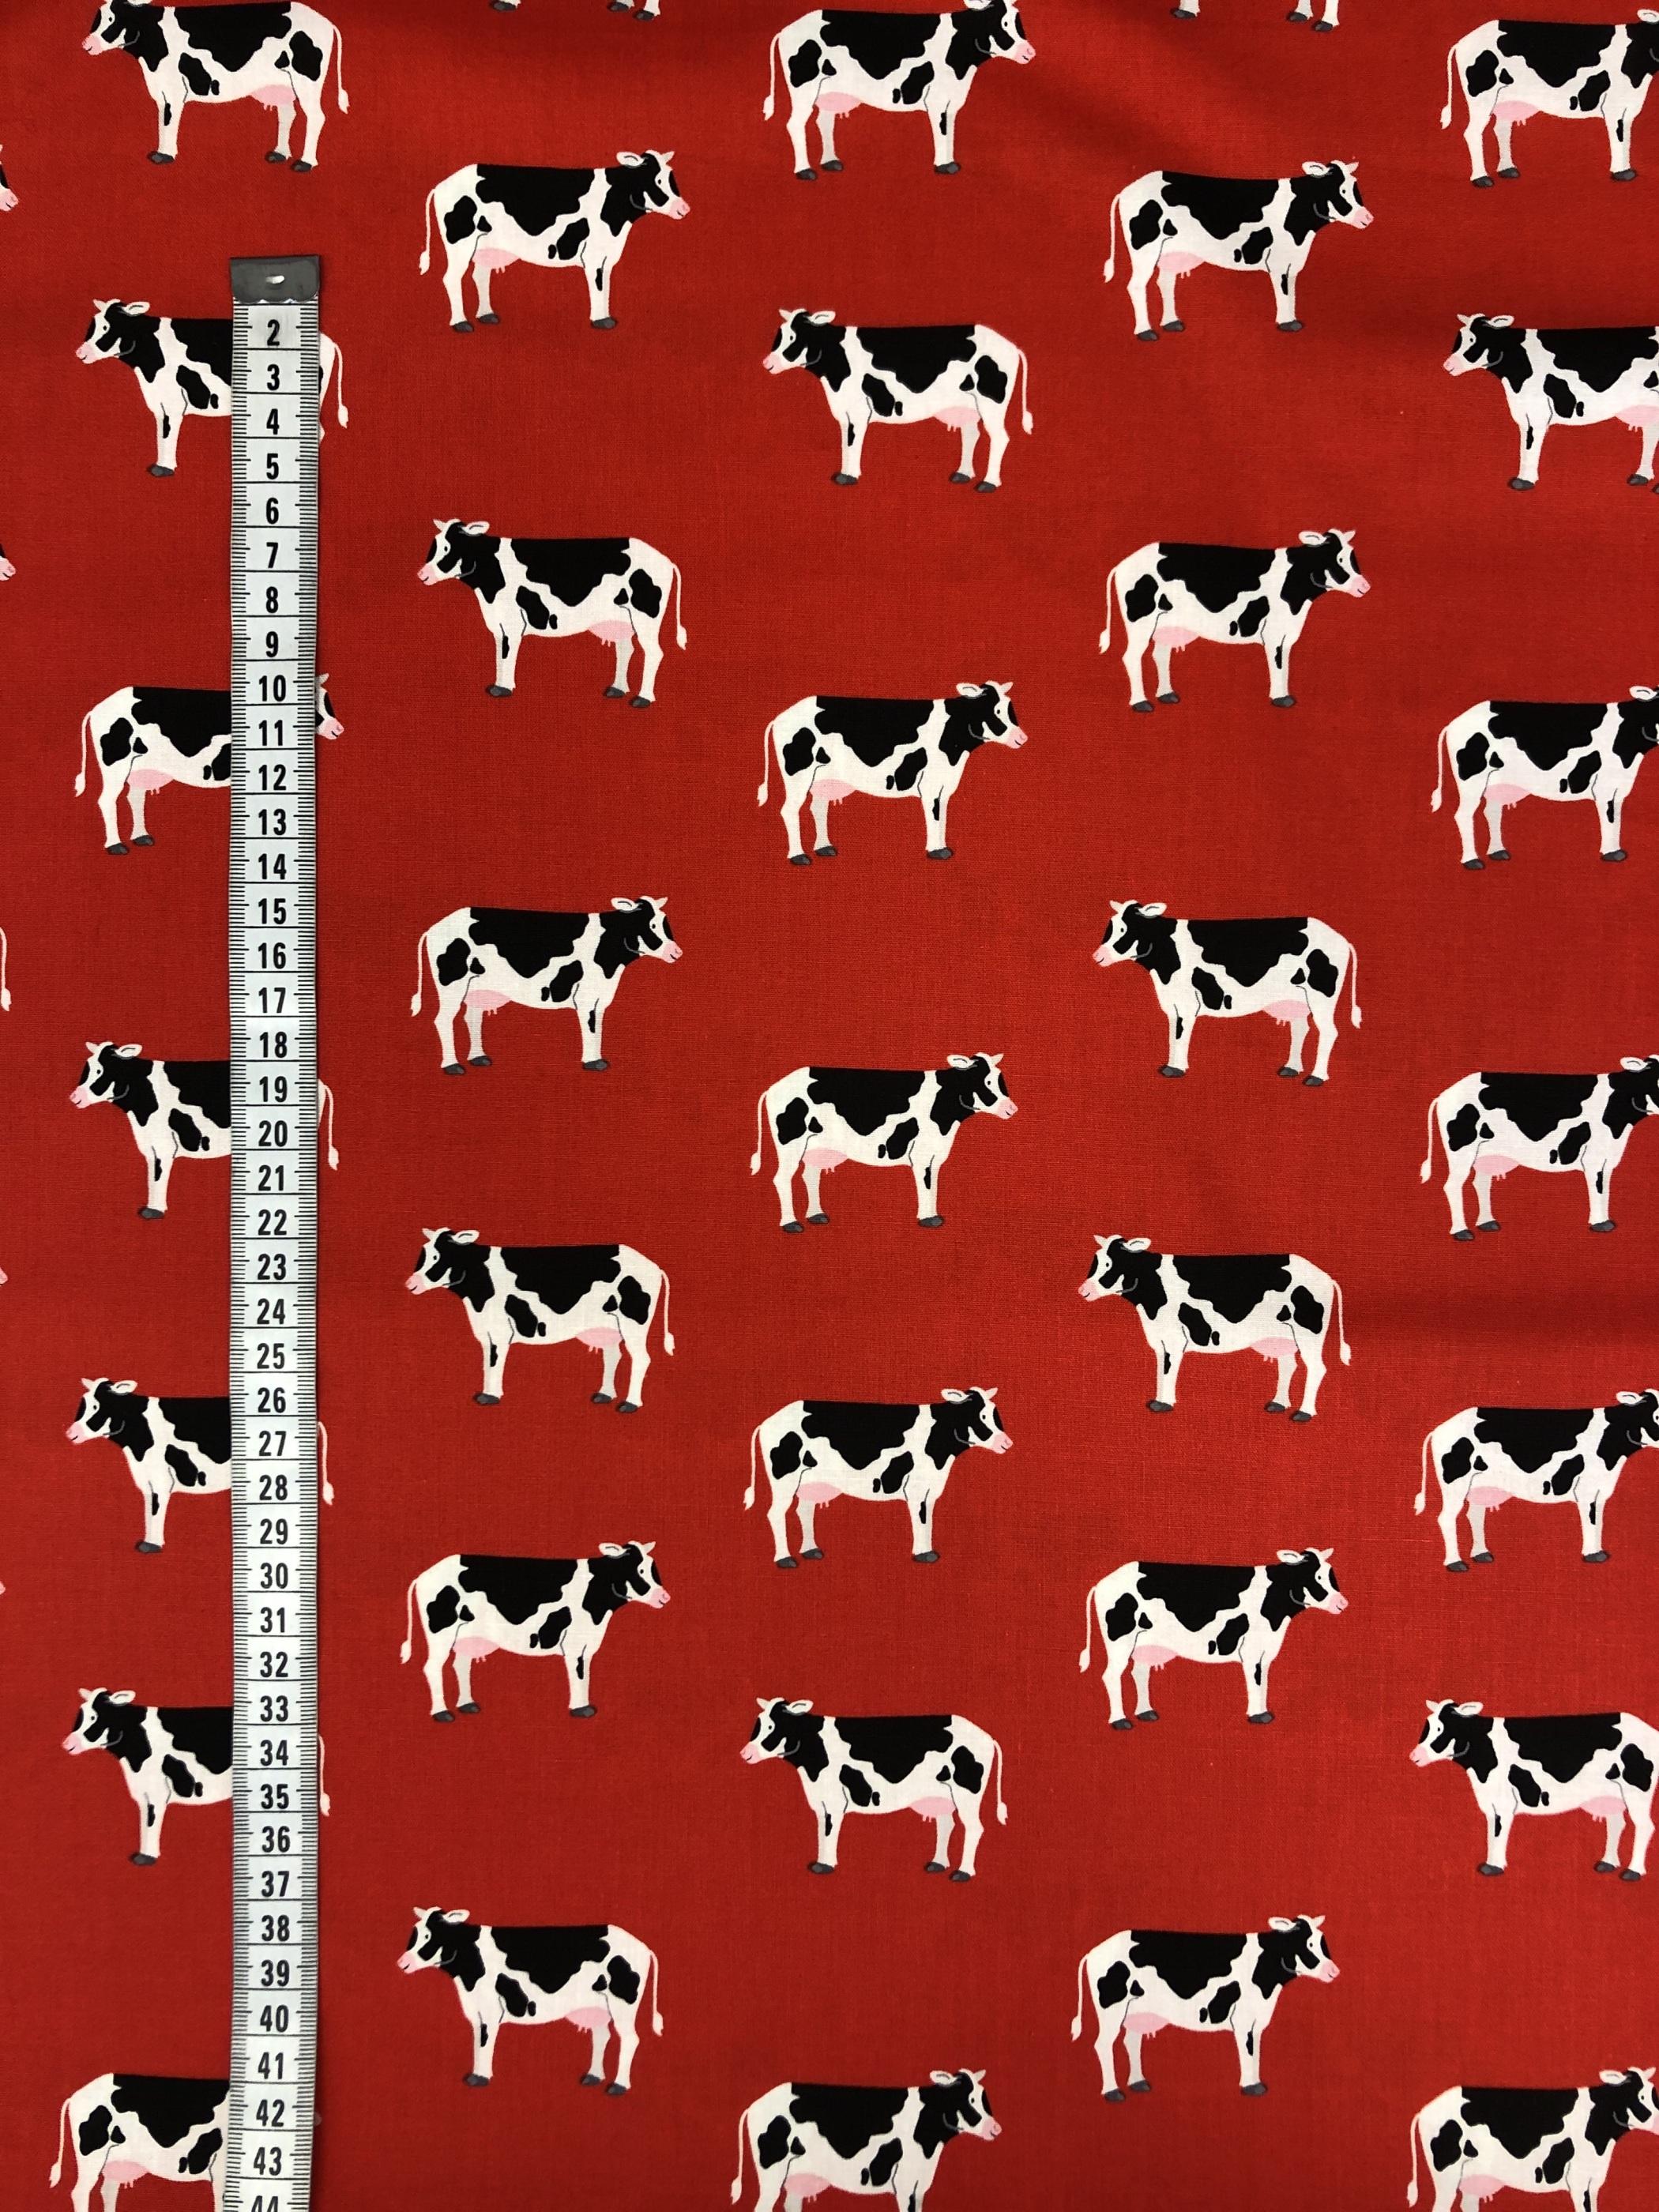 kossor ko röd bomull bomullsväv metervara modetyg barntyg tyglust laholm